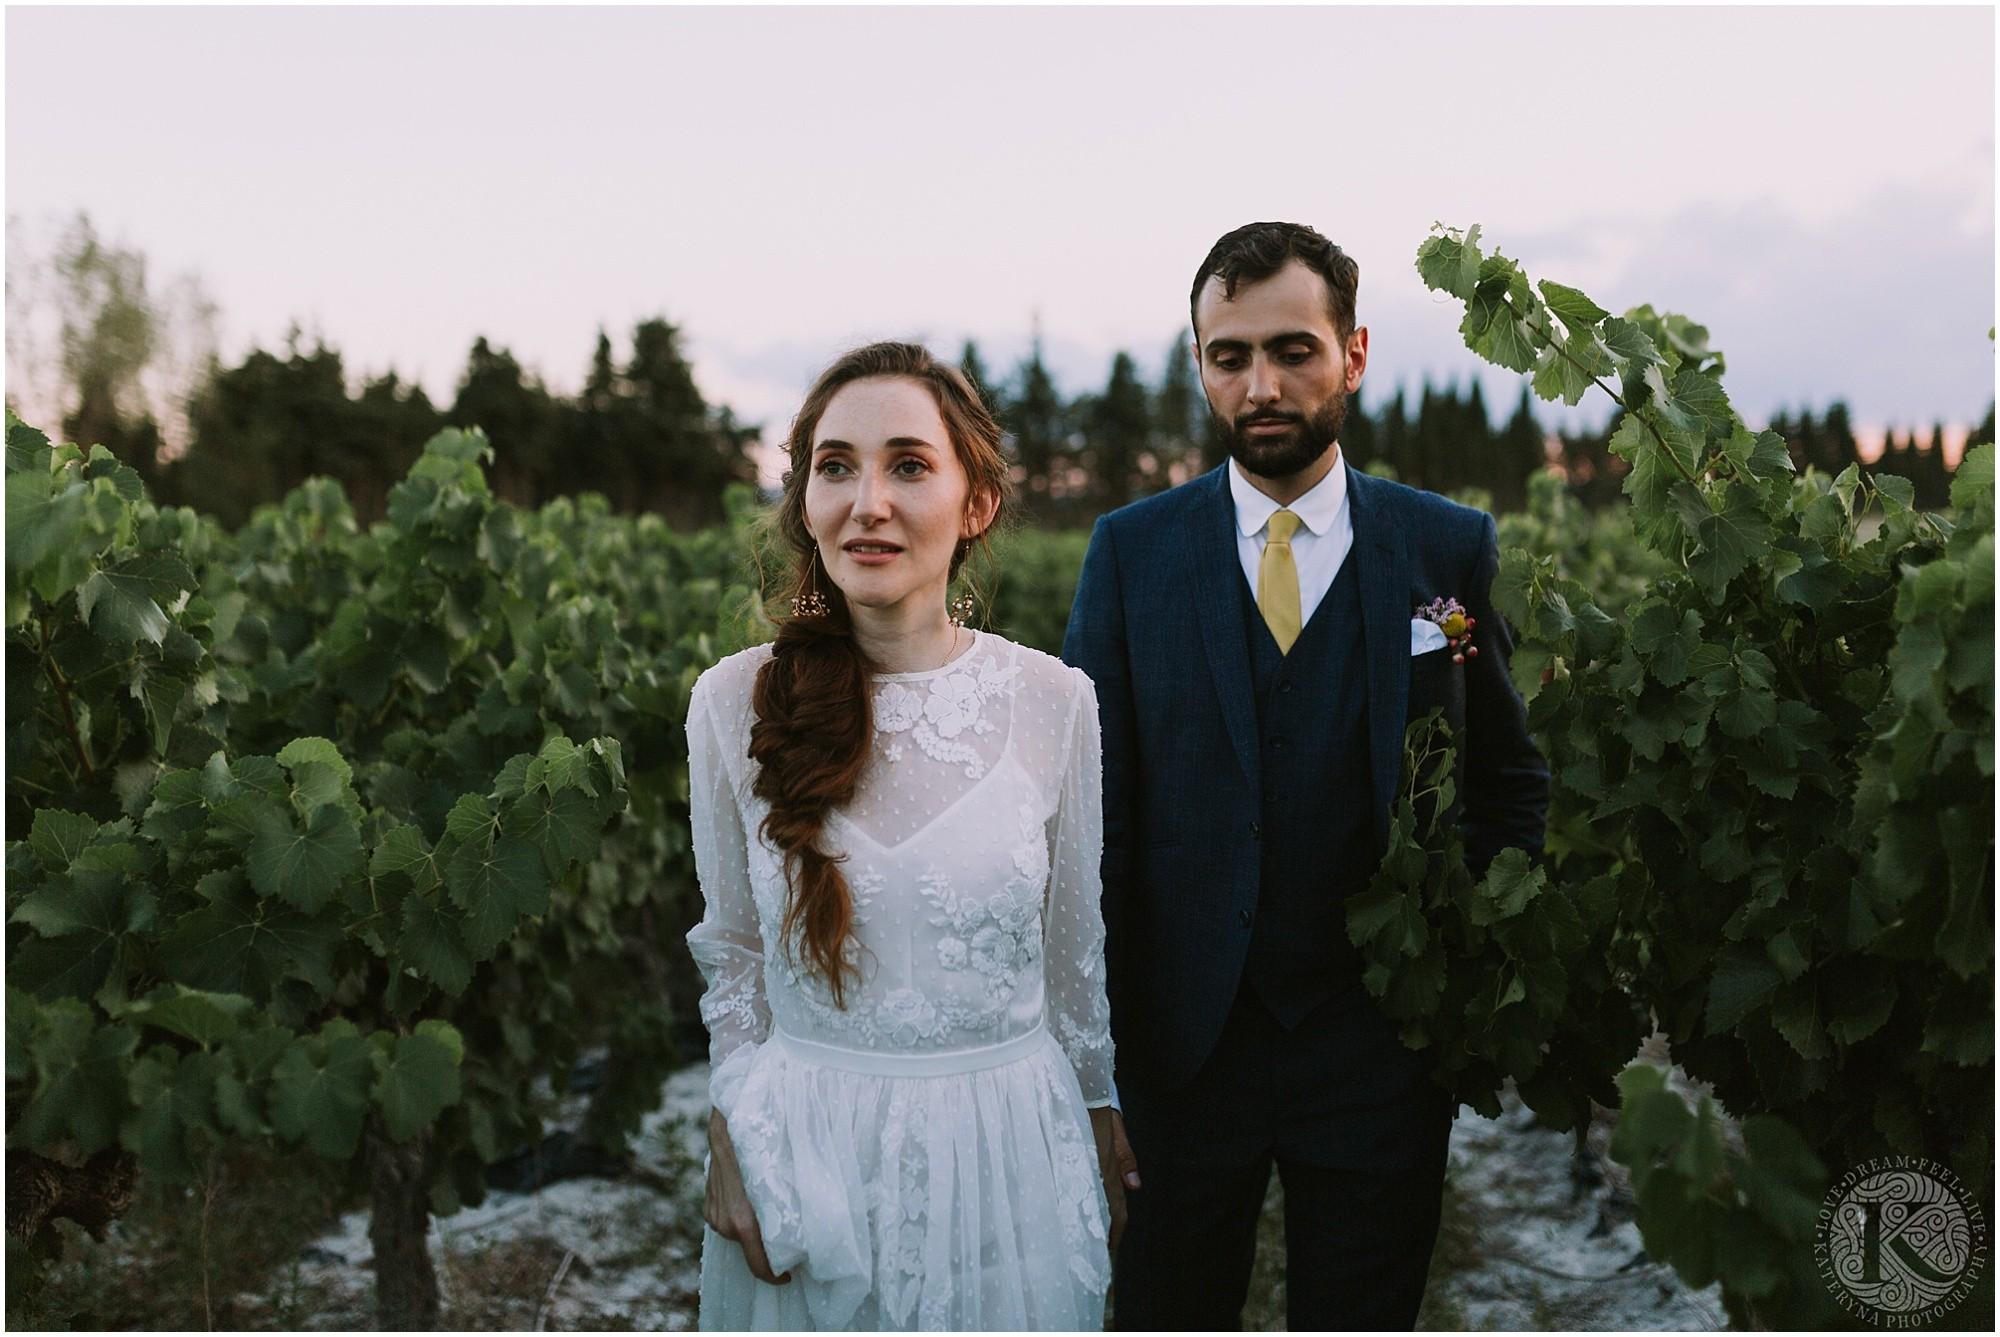 Kateryna-photos-photographe-mariage-vaucluse-provence-avignon-ferme-st-hugues_0079.jpg